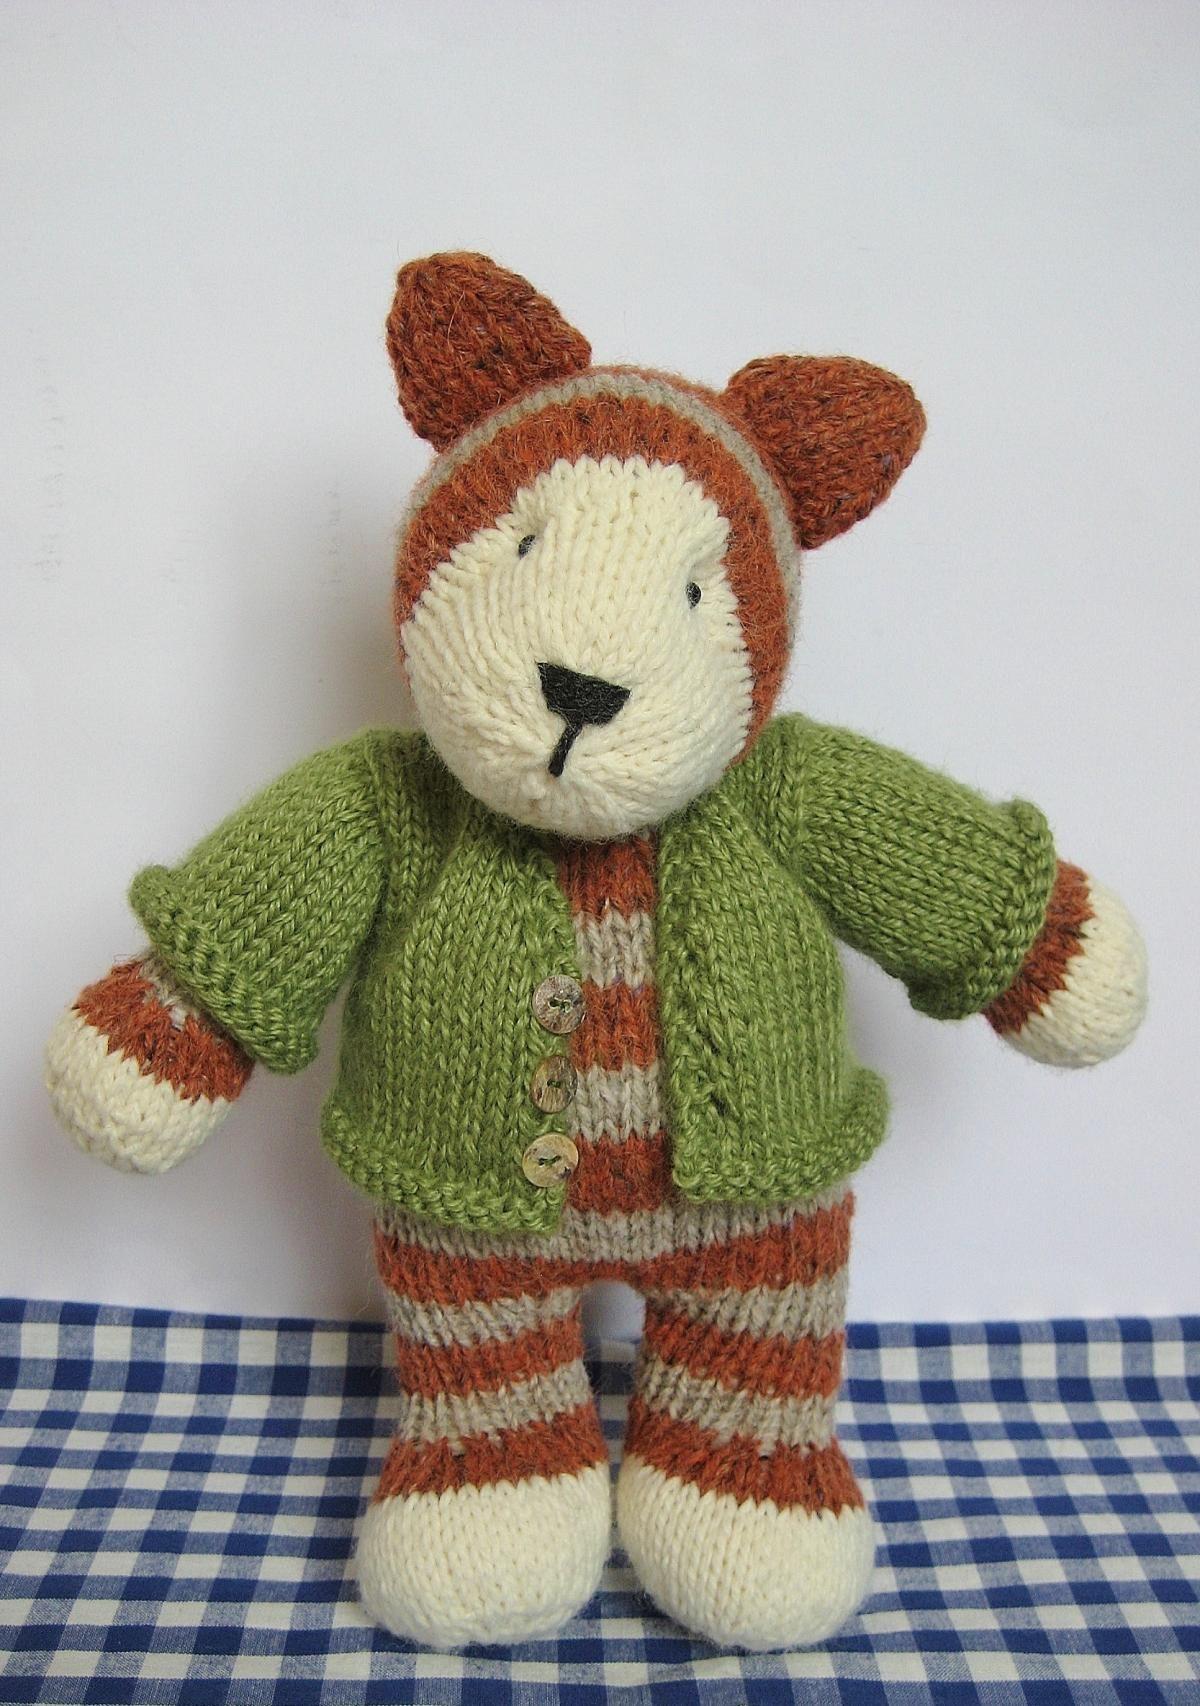 Tabby Cat toy knitting pattern   Knitting   Pinterest   Tabby cats ...